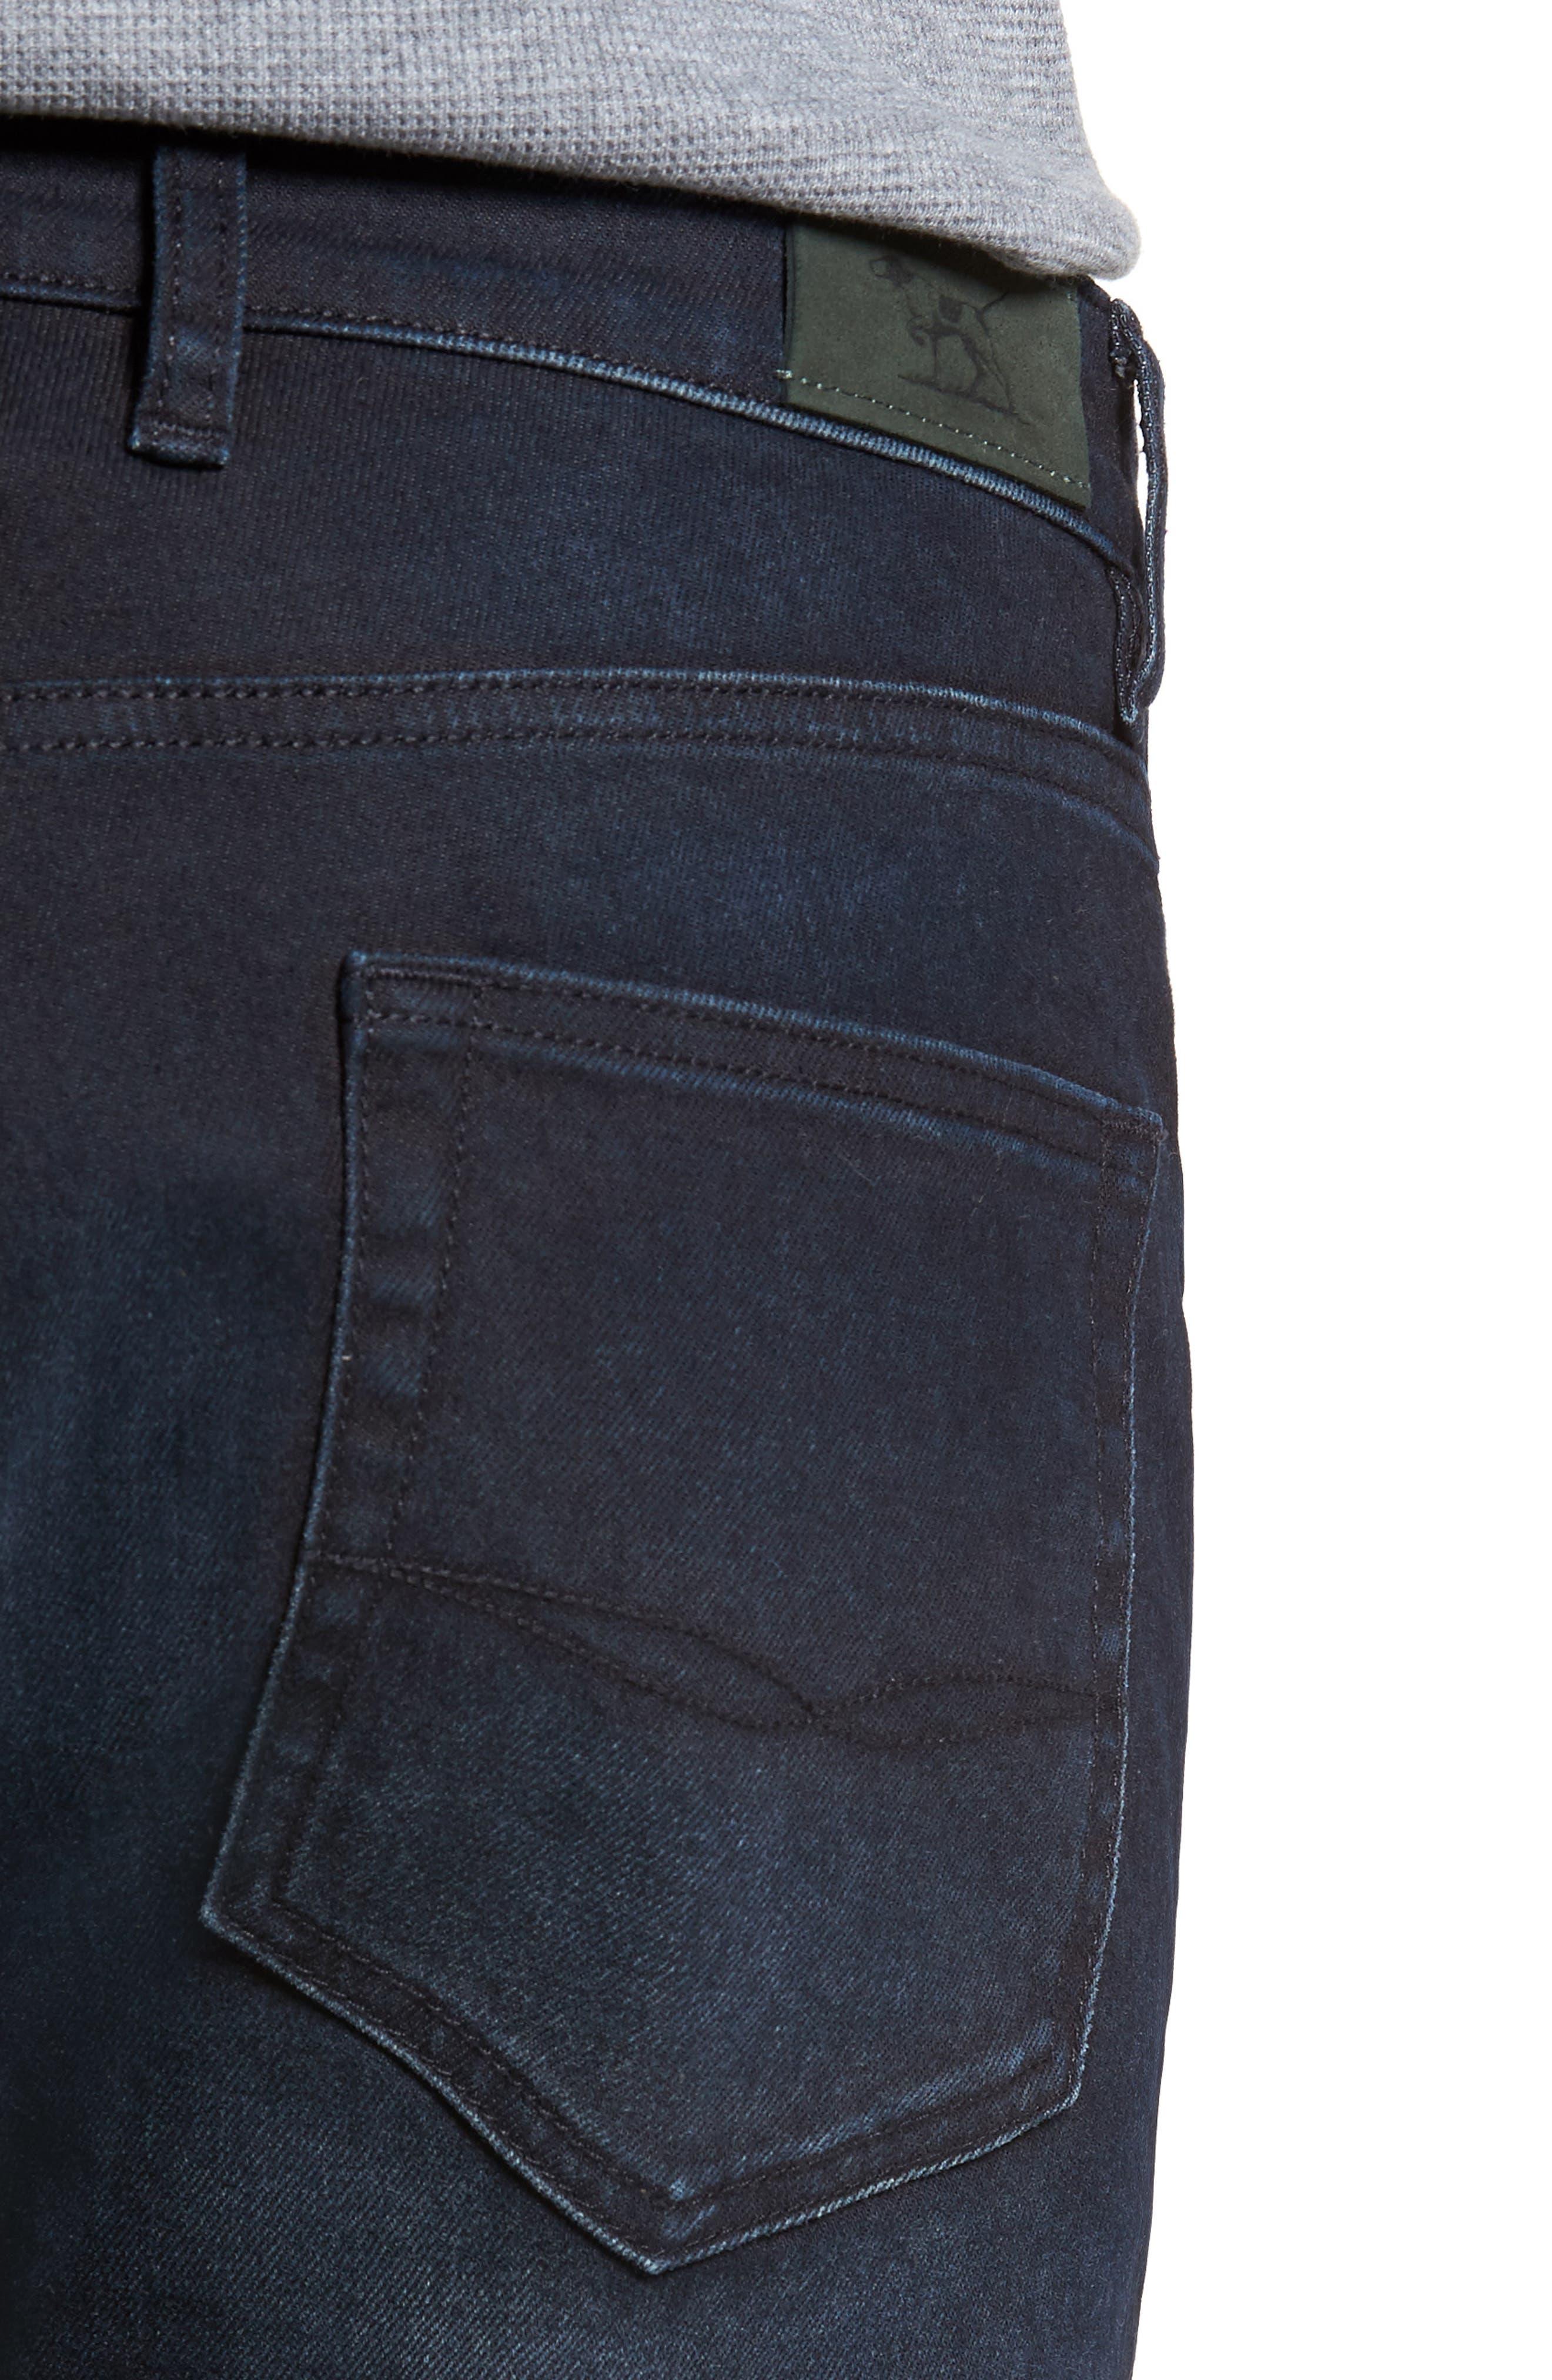 Mapleton Slim Fit Jeans,                             Alternate thumbnail 4, color,                             DENIM